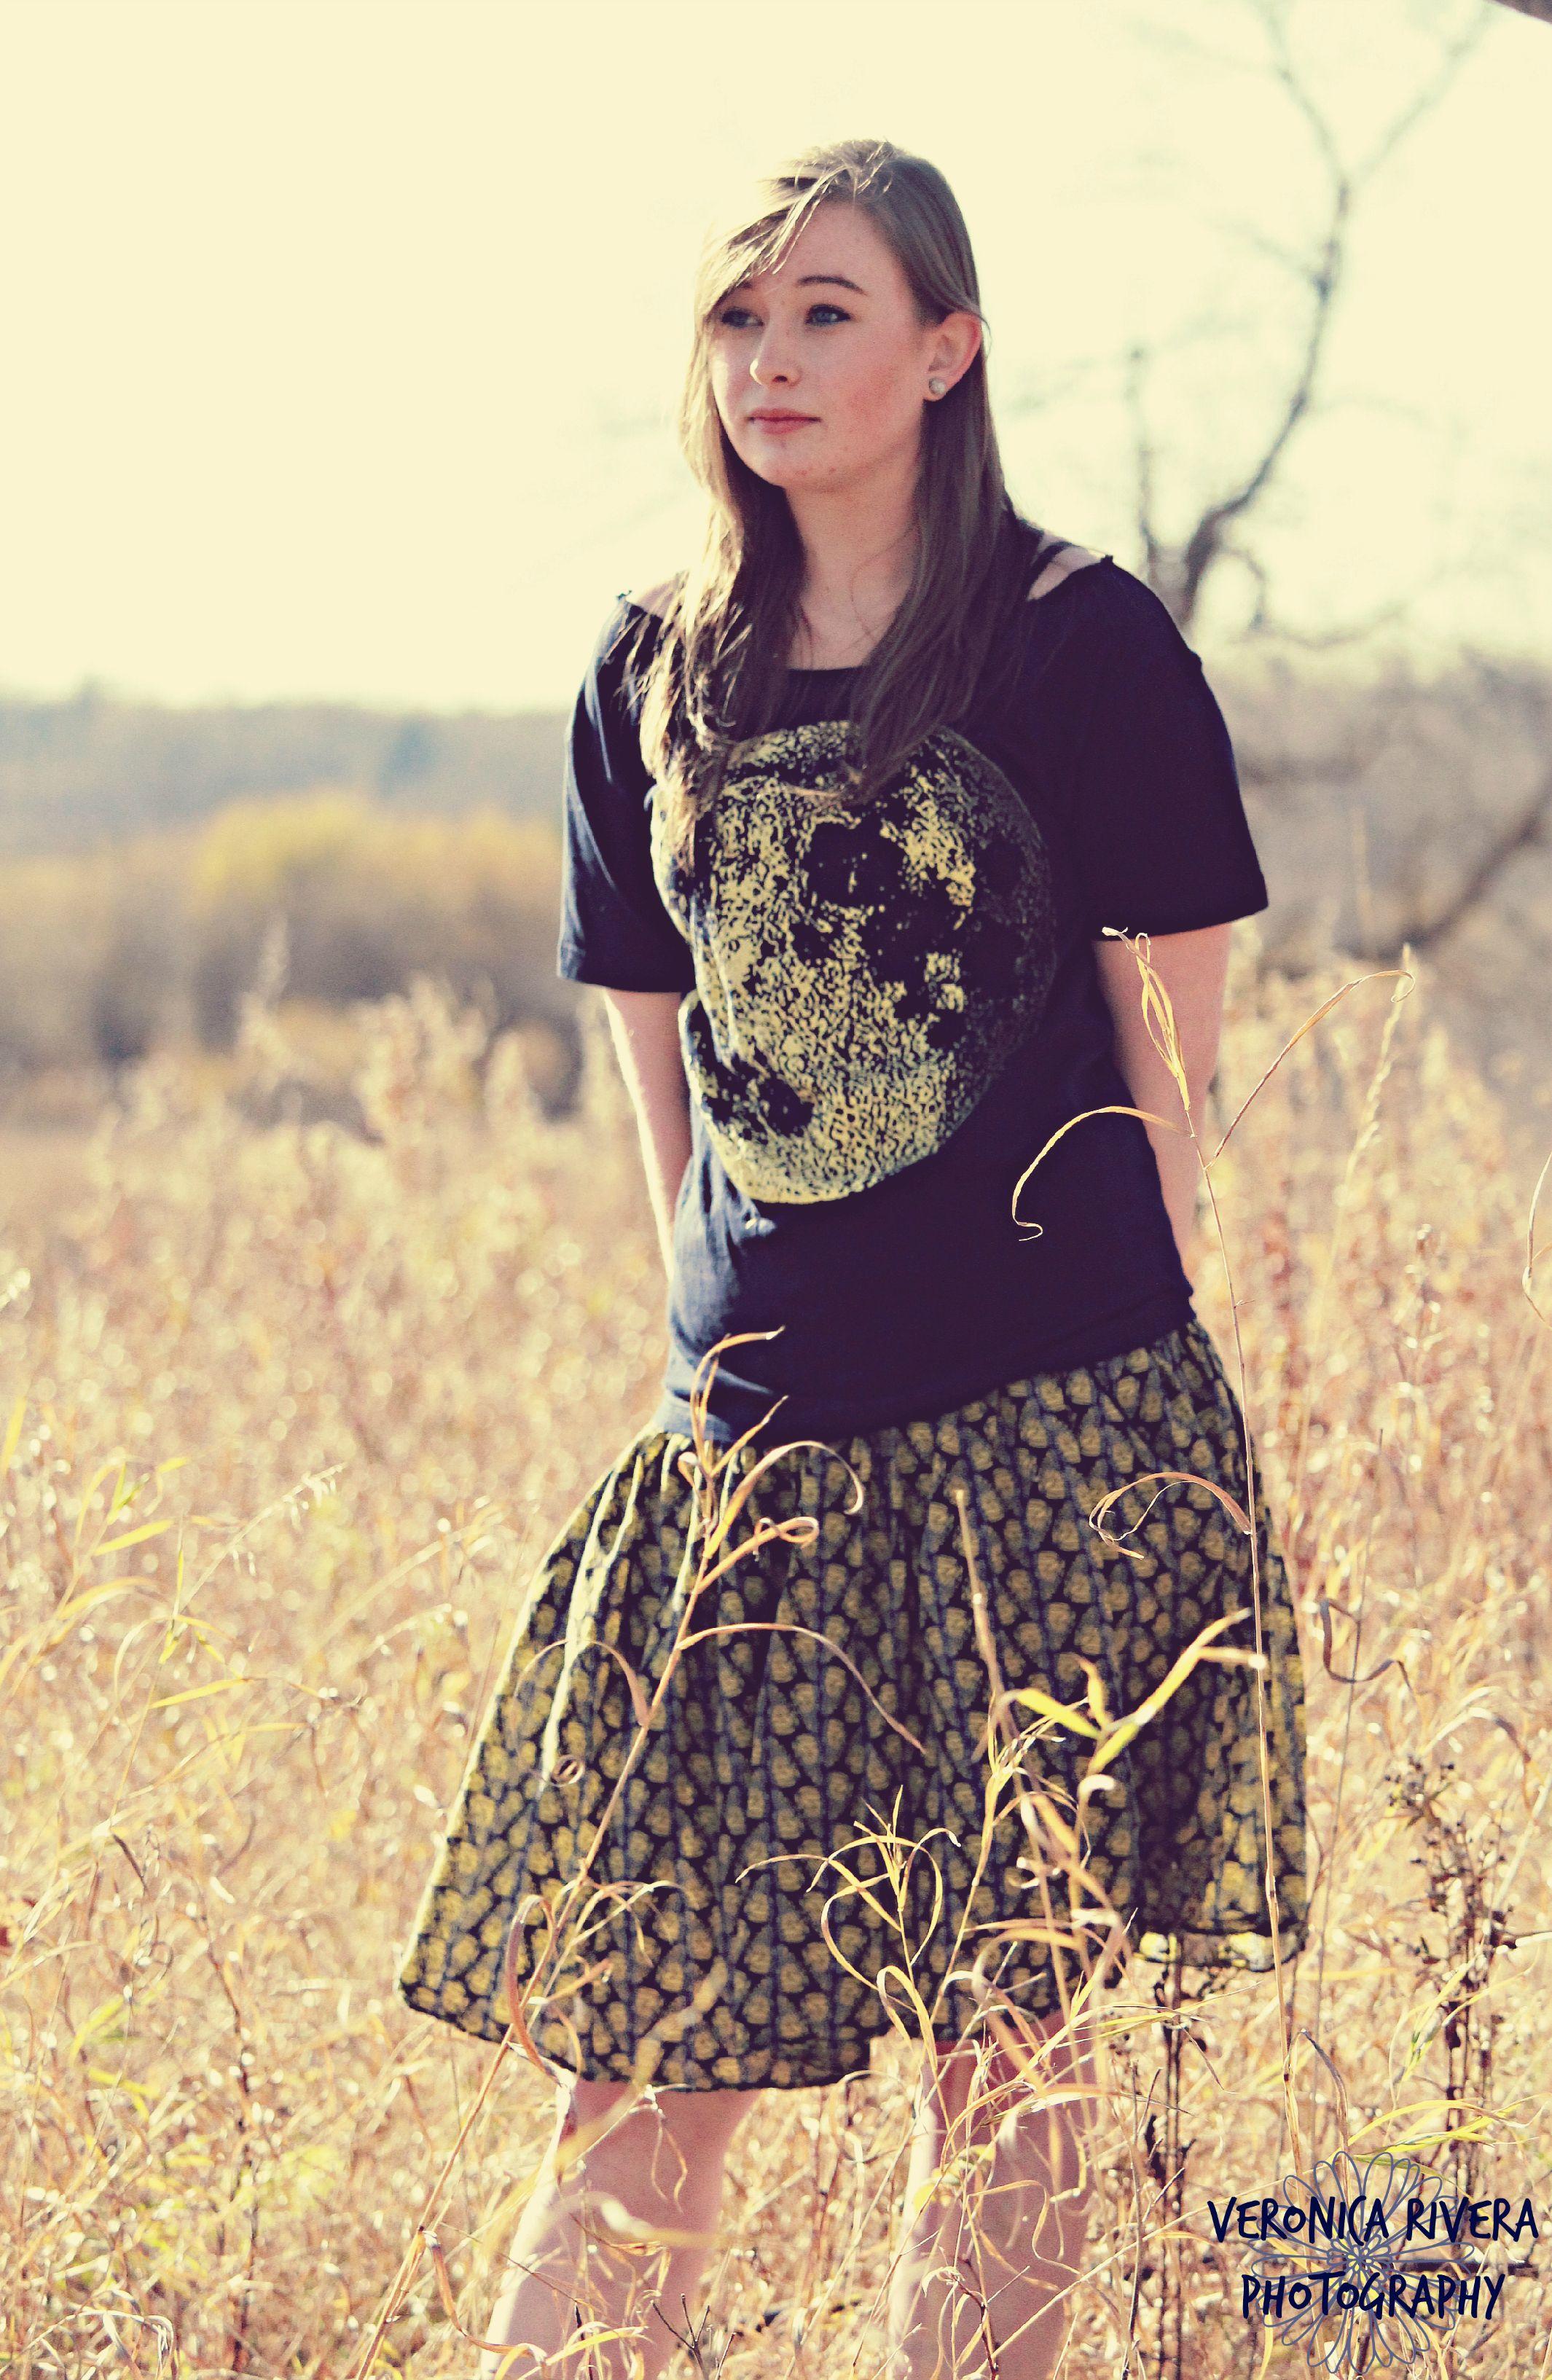 Photographer: Veronica Lee Model: Joelly E.